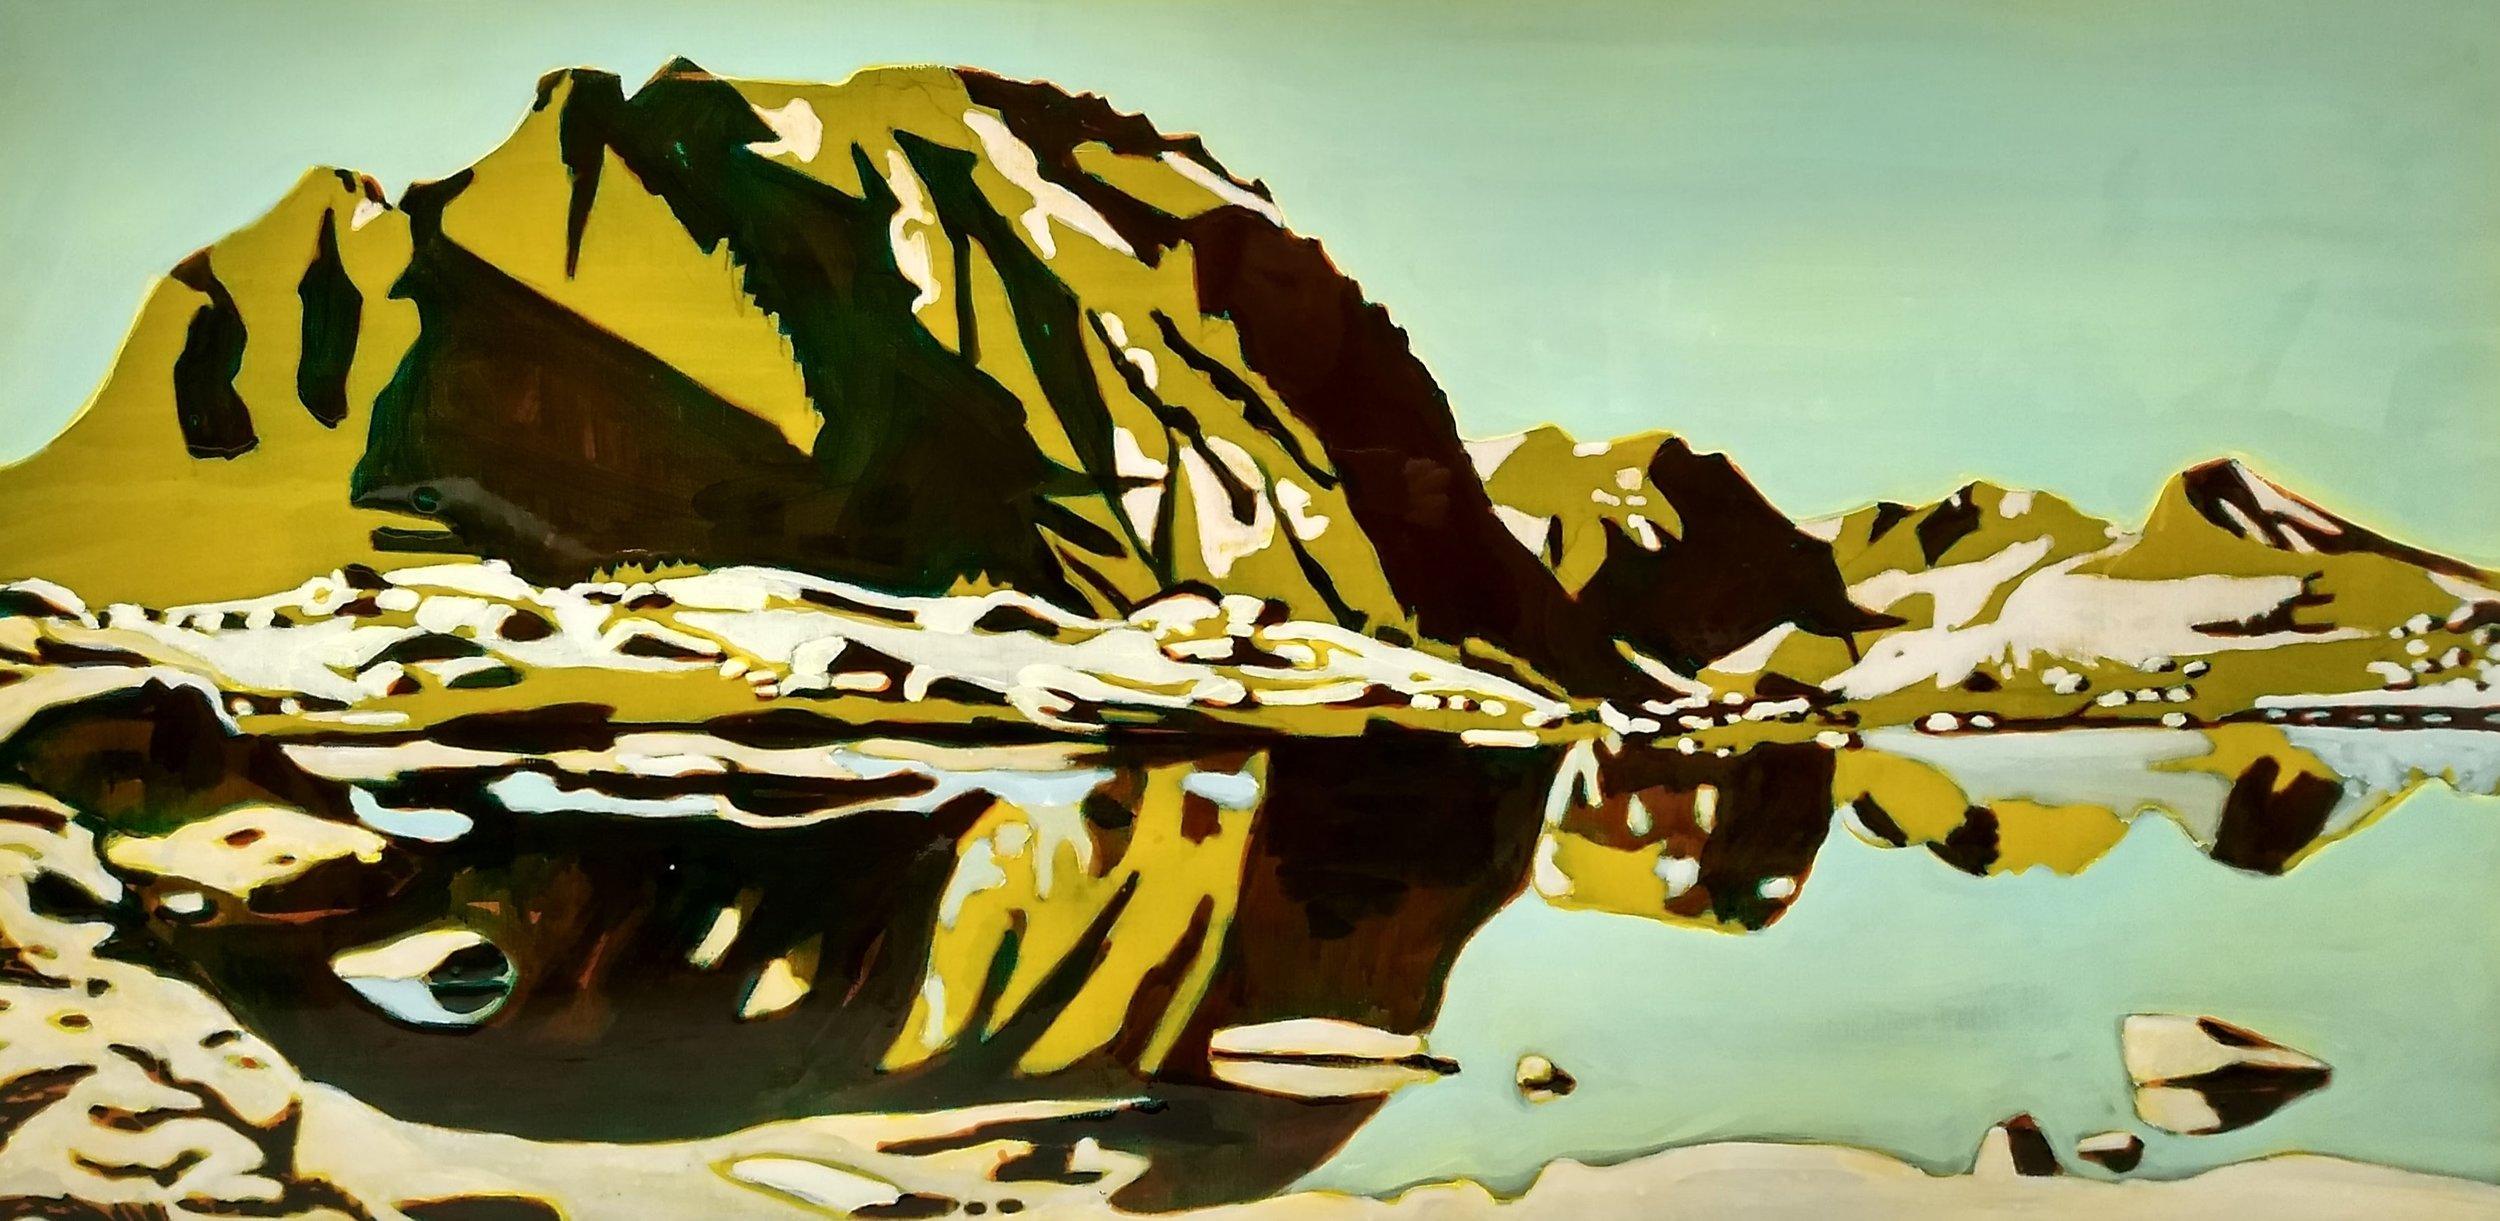 PINCHOT PASS  70x140 cm acrylic and epoxy on canvas